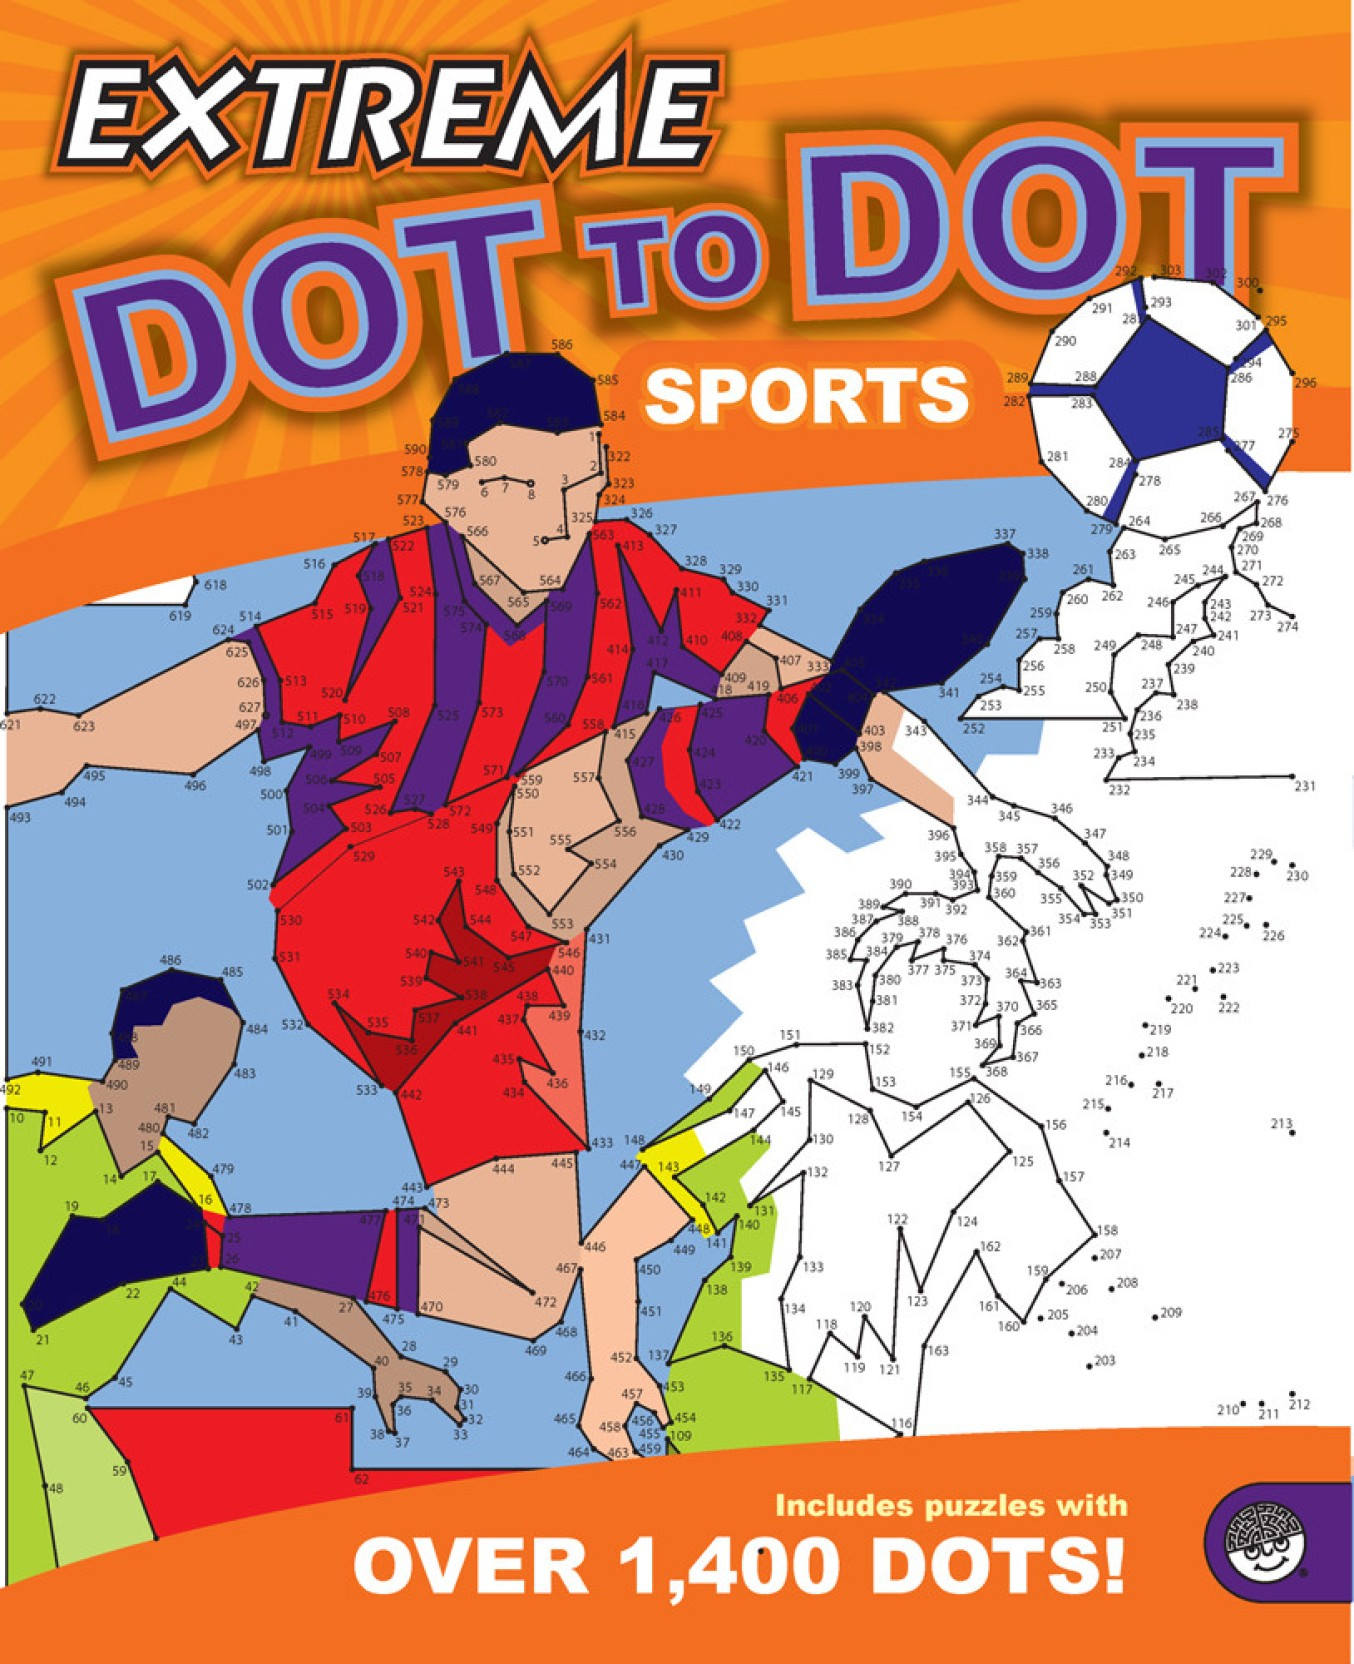 ab4e35bcf251b Mindware Extreme Dot To Dot : Sports - Extreme Dot To Dot : Sports ...